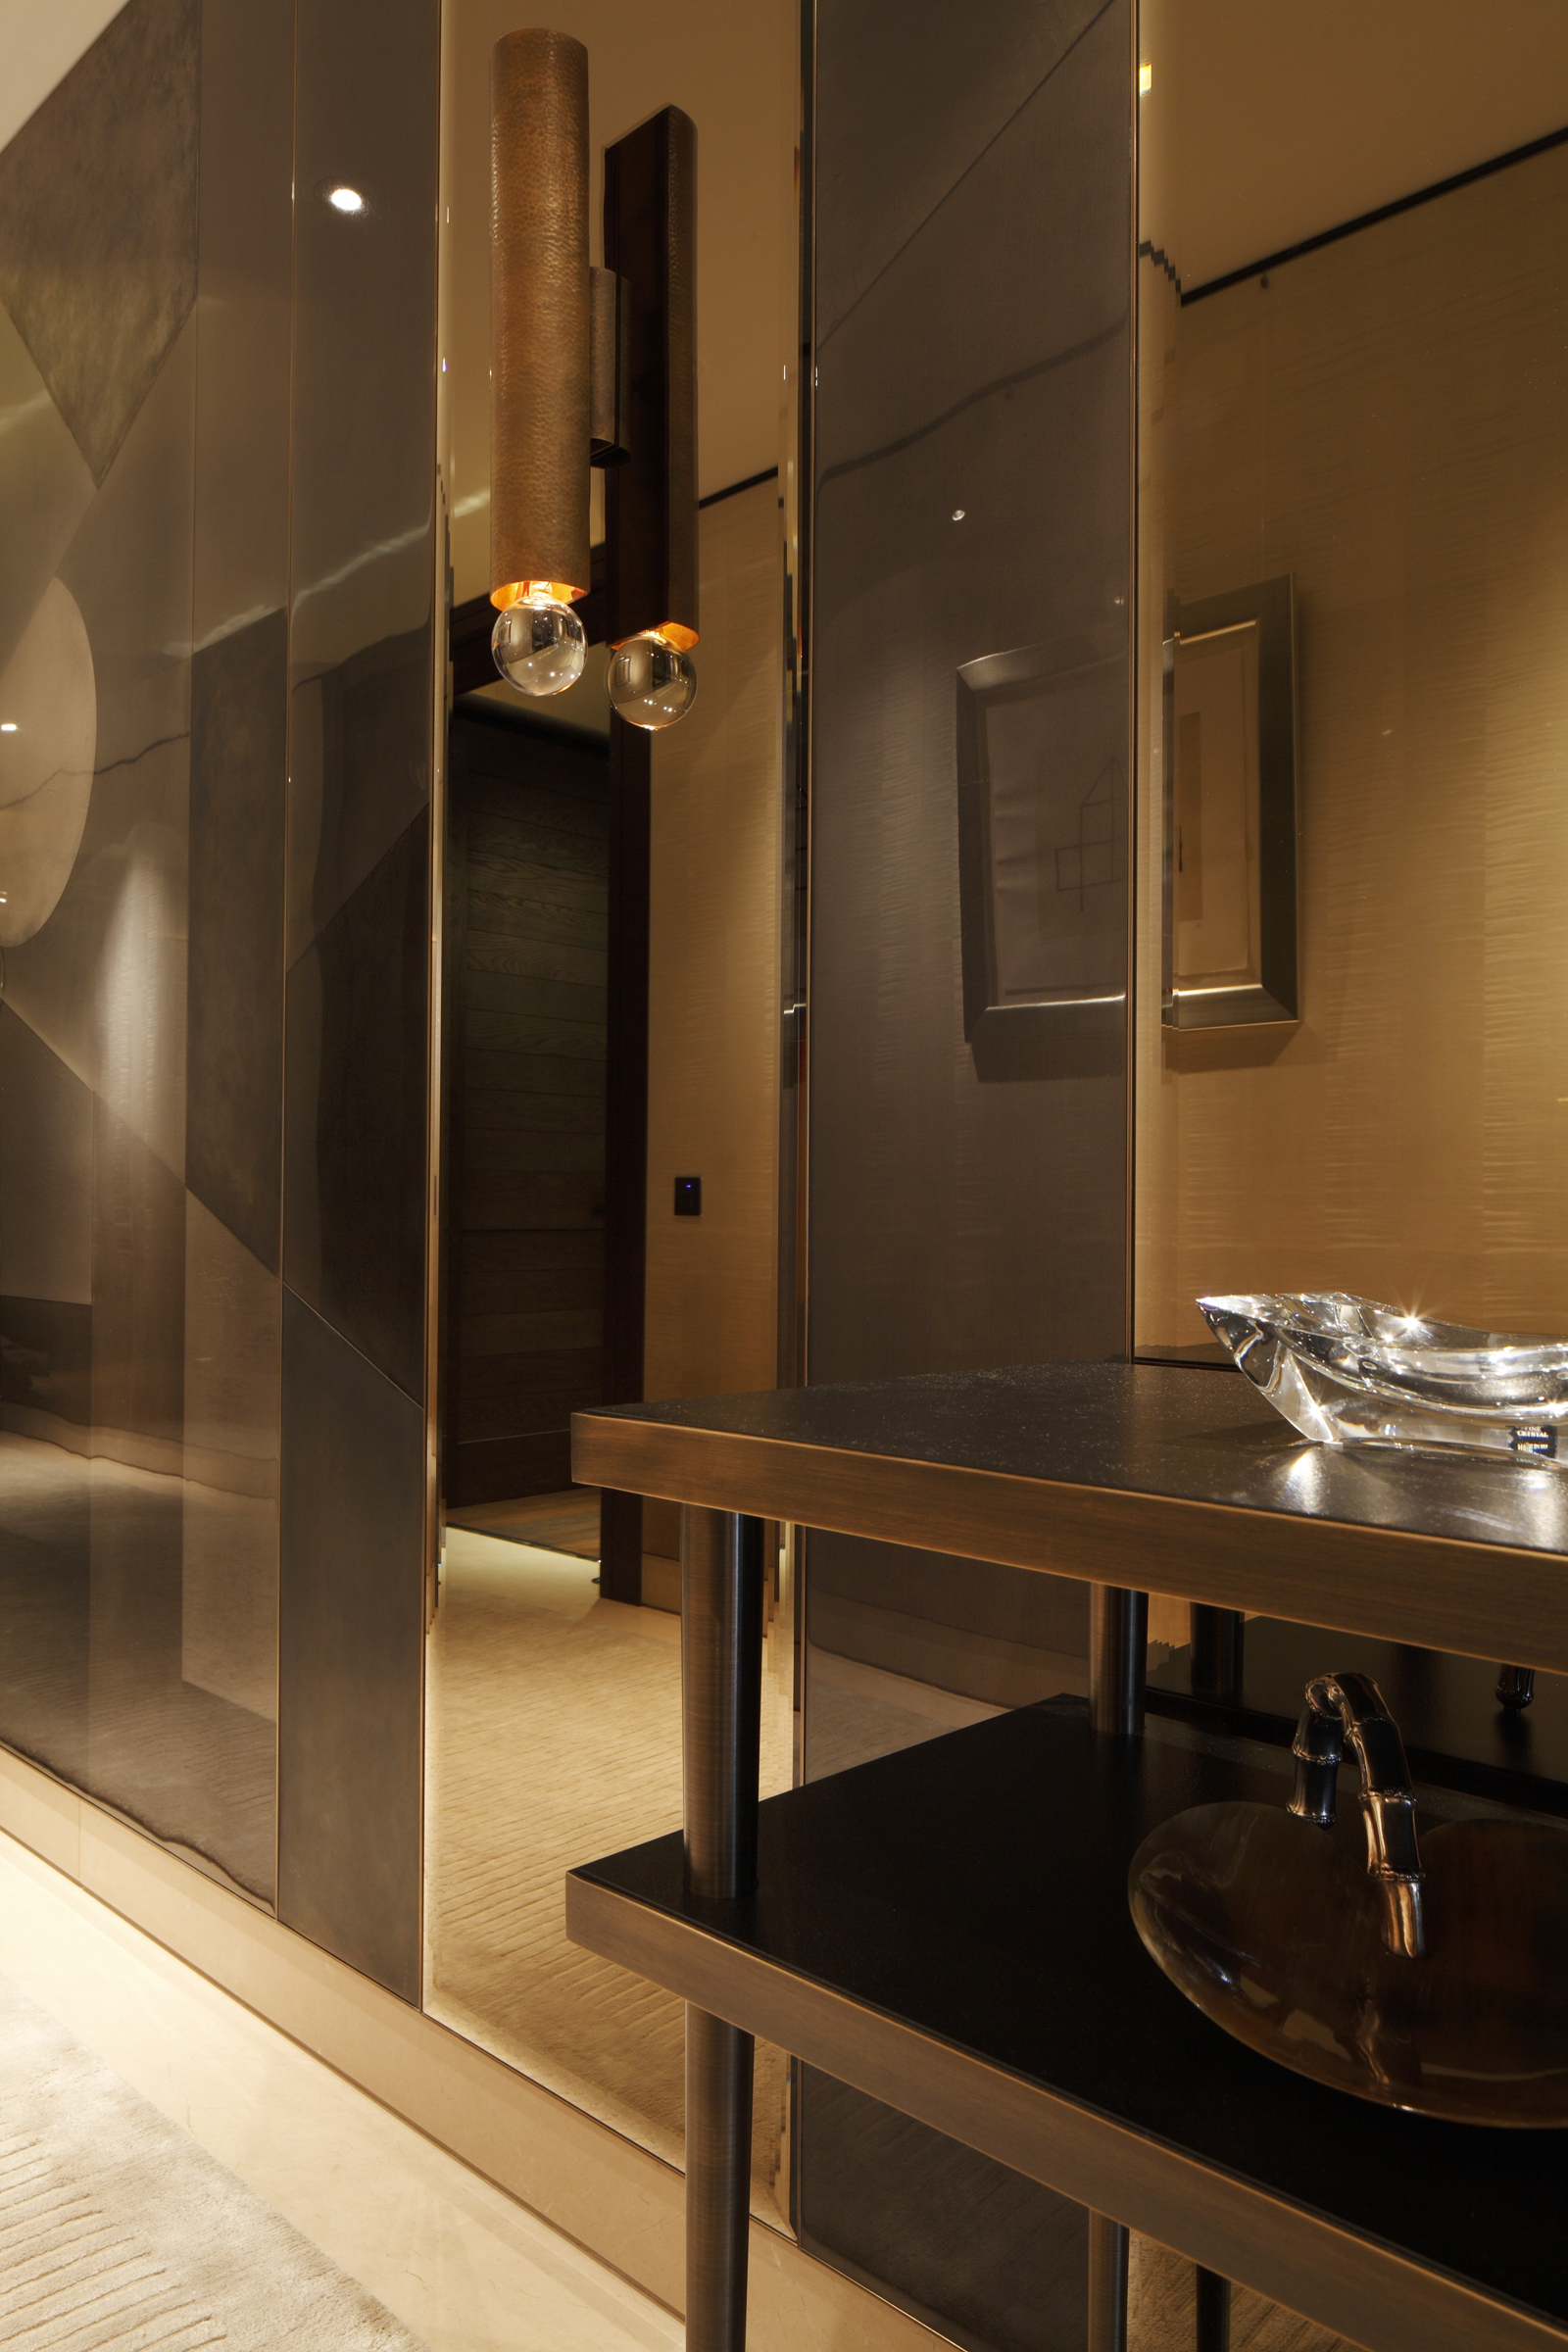 Casa Forma Named Best Interior Design Apartment London At The International Property Awards 2013